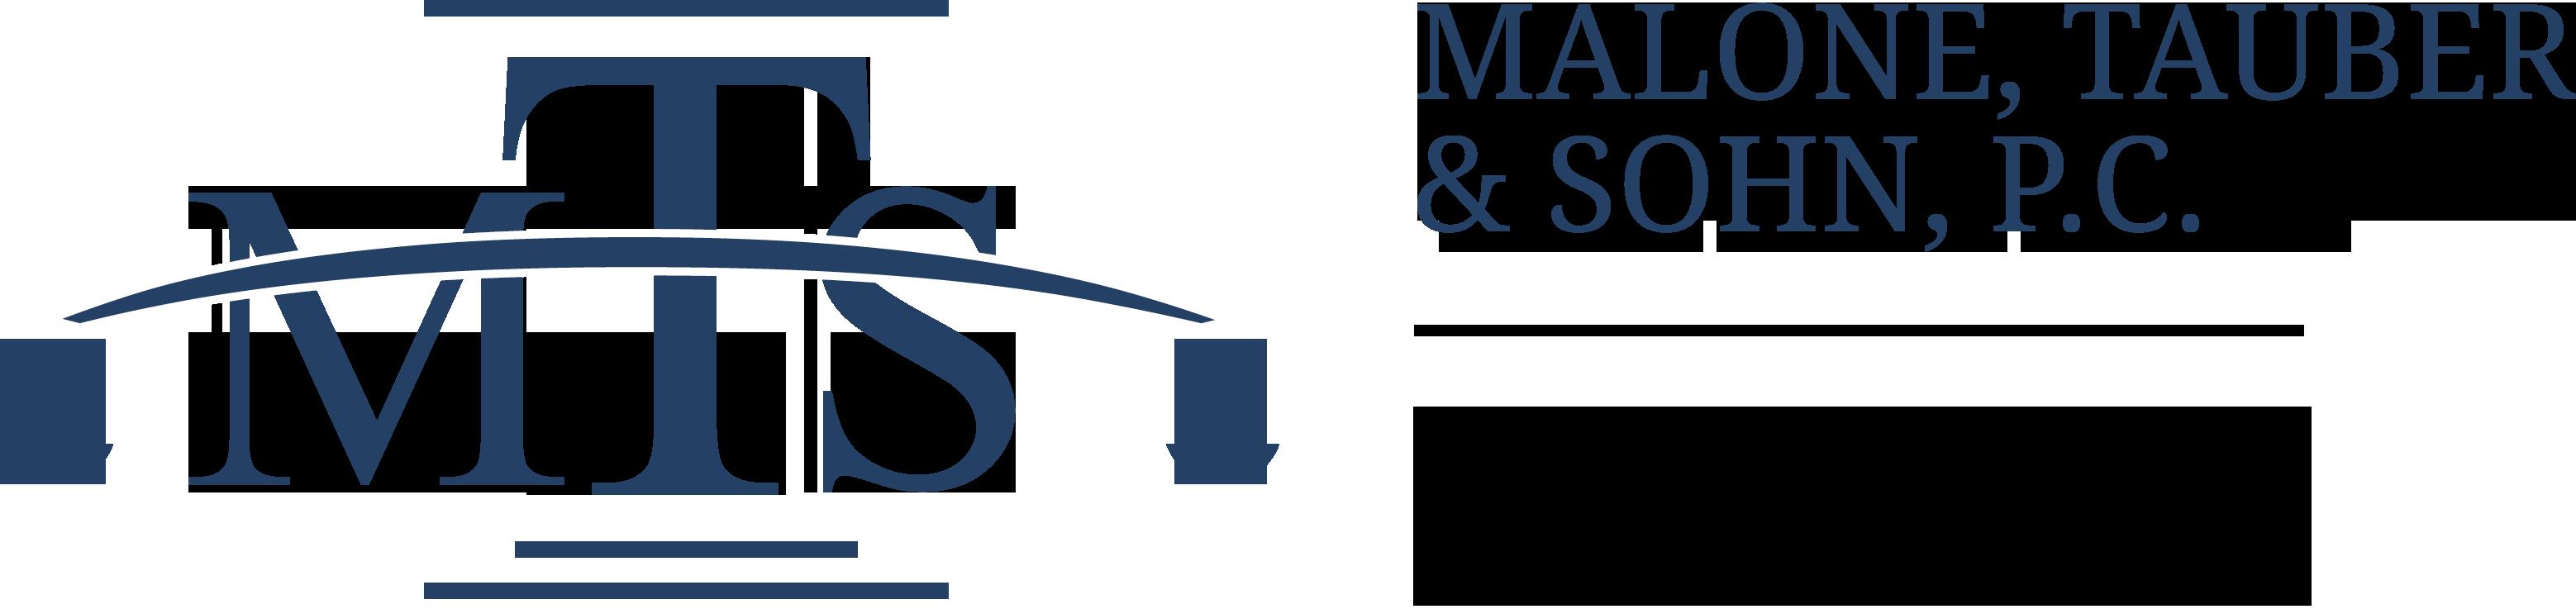 Malone Tauber & Sohn, P.C.